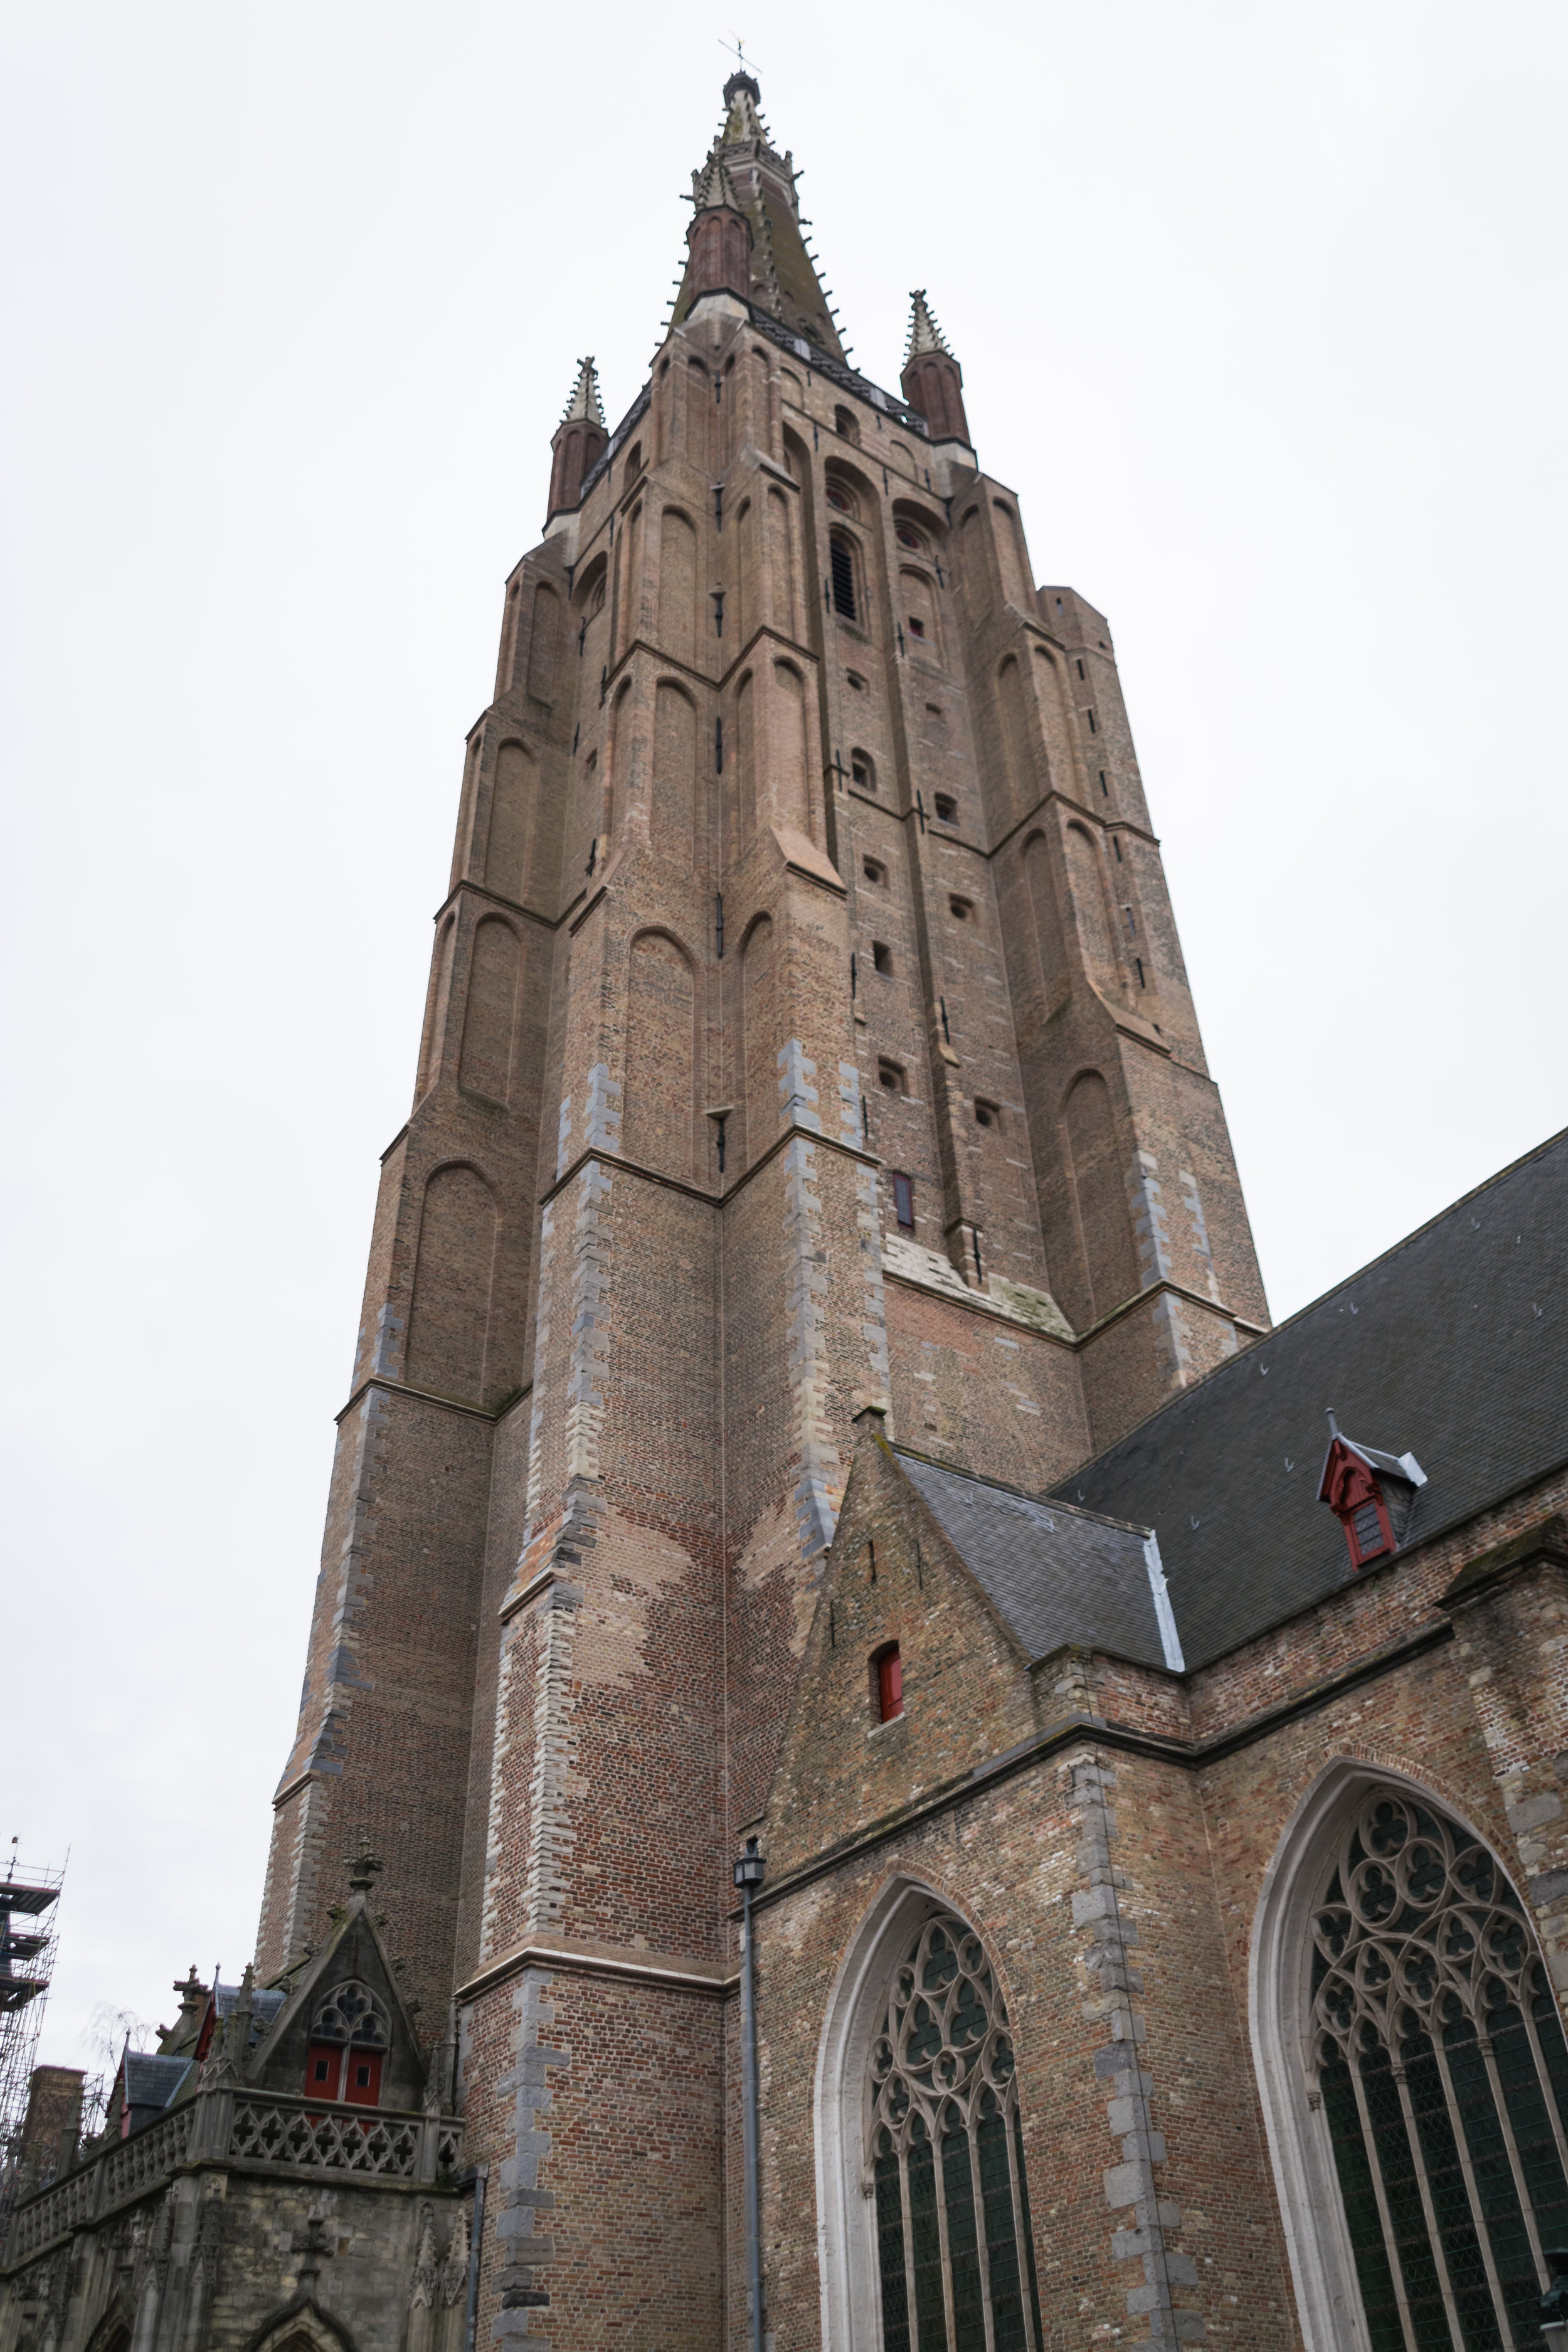 Sint-Salvatorskathedraal